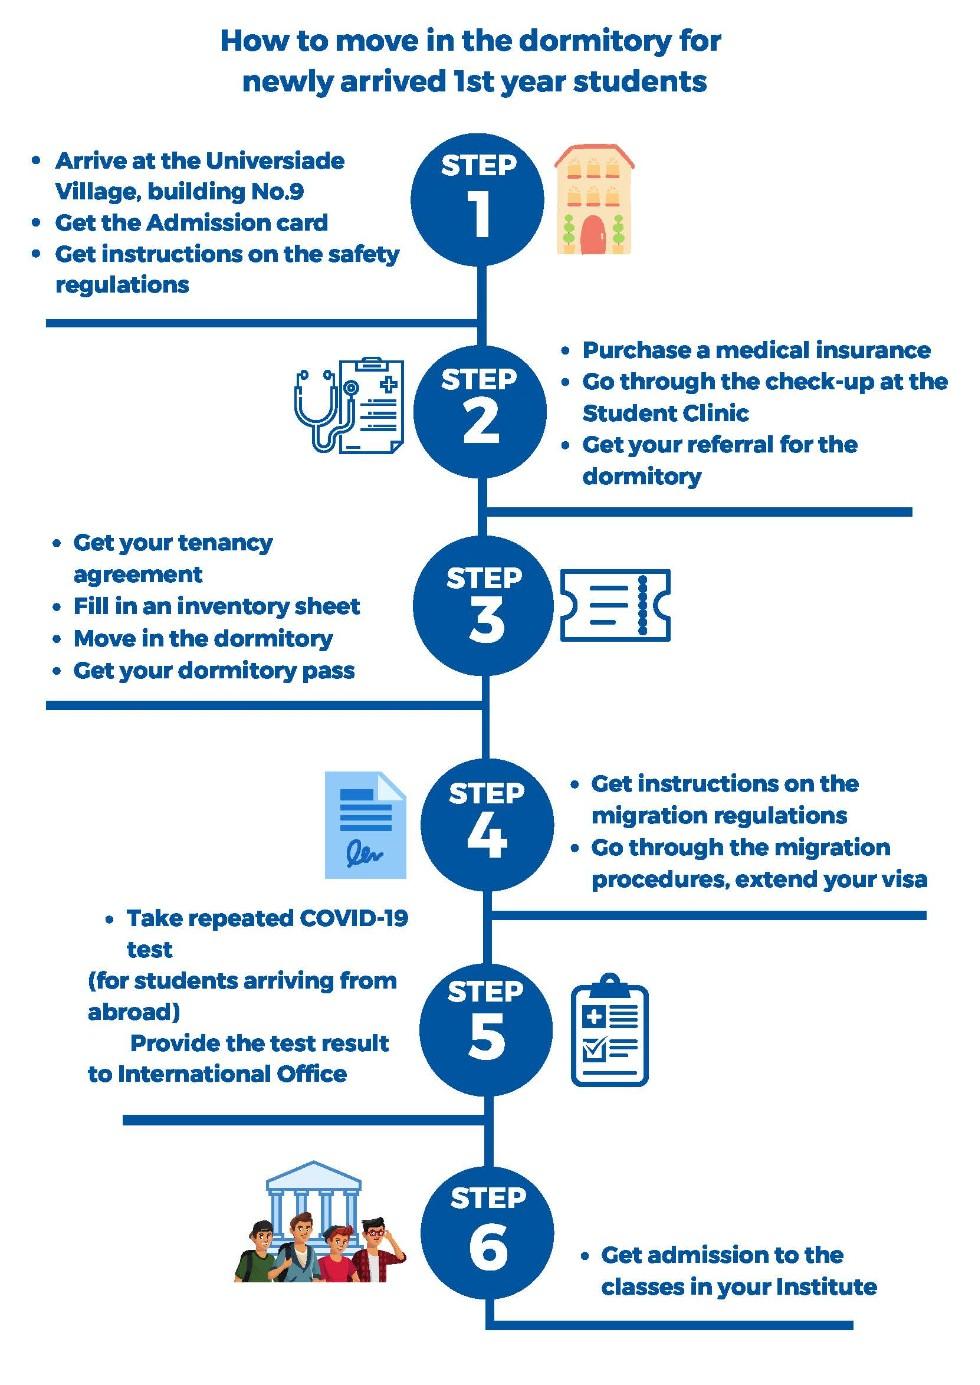 ПОРТАЛ КФУ \ Admission \ Arrange your arrival \ Registration and dormitory check-in procedure 2020